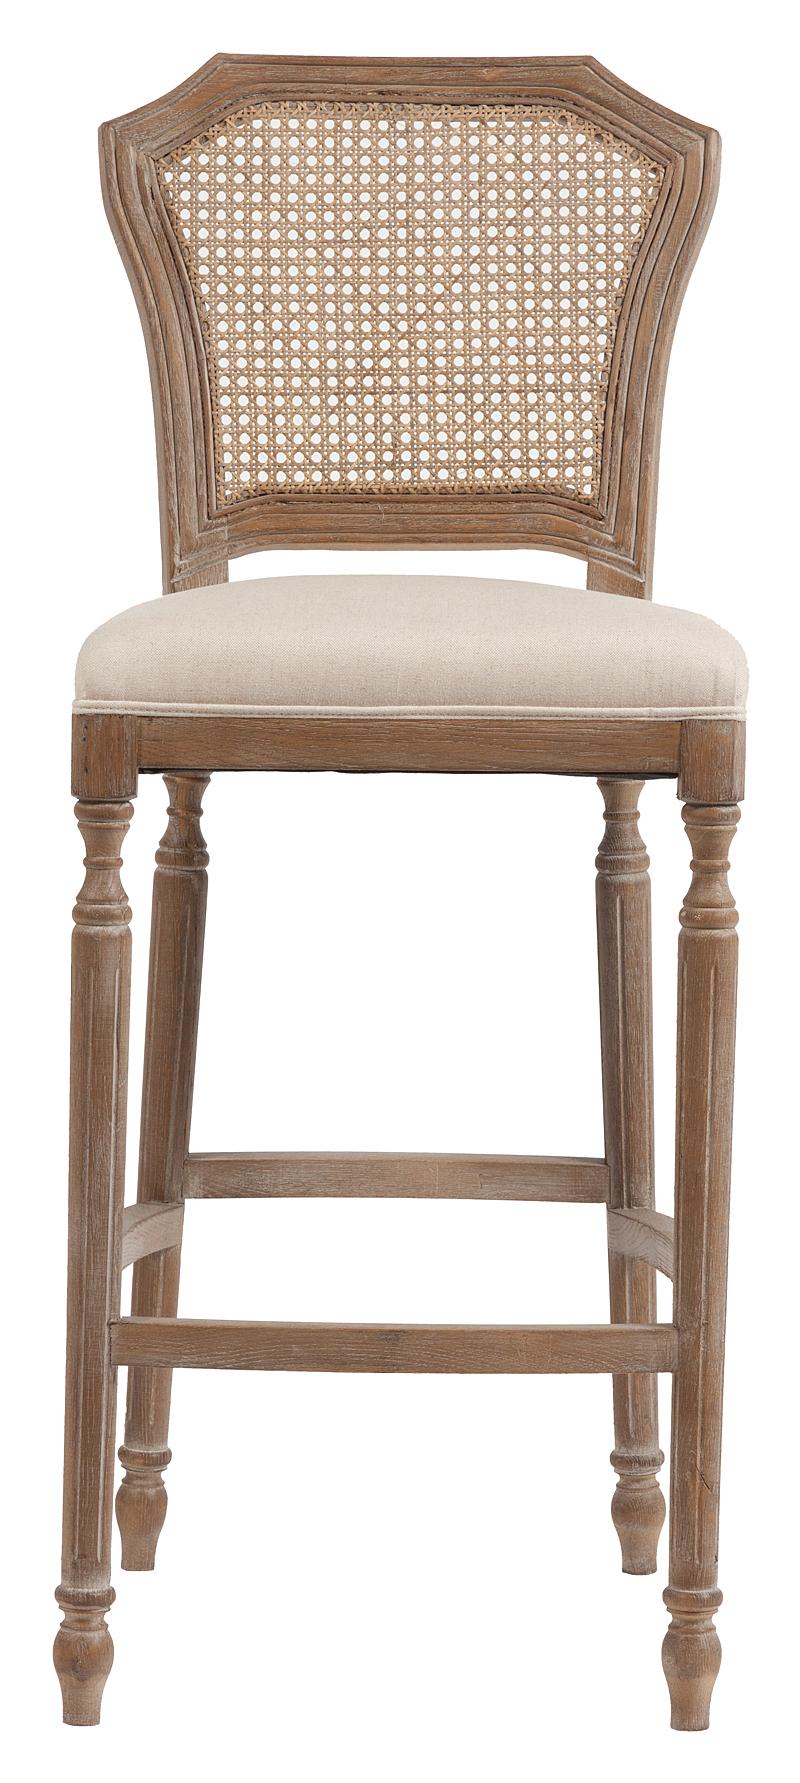 Барный стул Vintage French Nailhead Cane Back Кремовый Лен DG-HOMEСтулья<br>. Бренд - DG-HOME. материал - Ткань, Поролон, Дерево.<br><br>популярные производители: DG-HOME<br>ширина/диаметр: 0<br>материал: Ткань, Поролон, Дерево